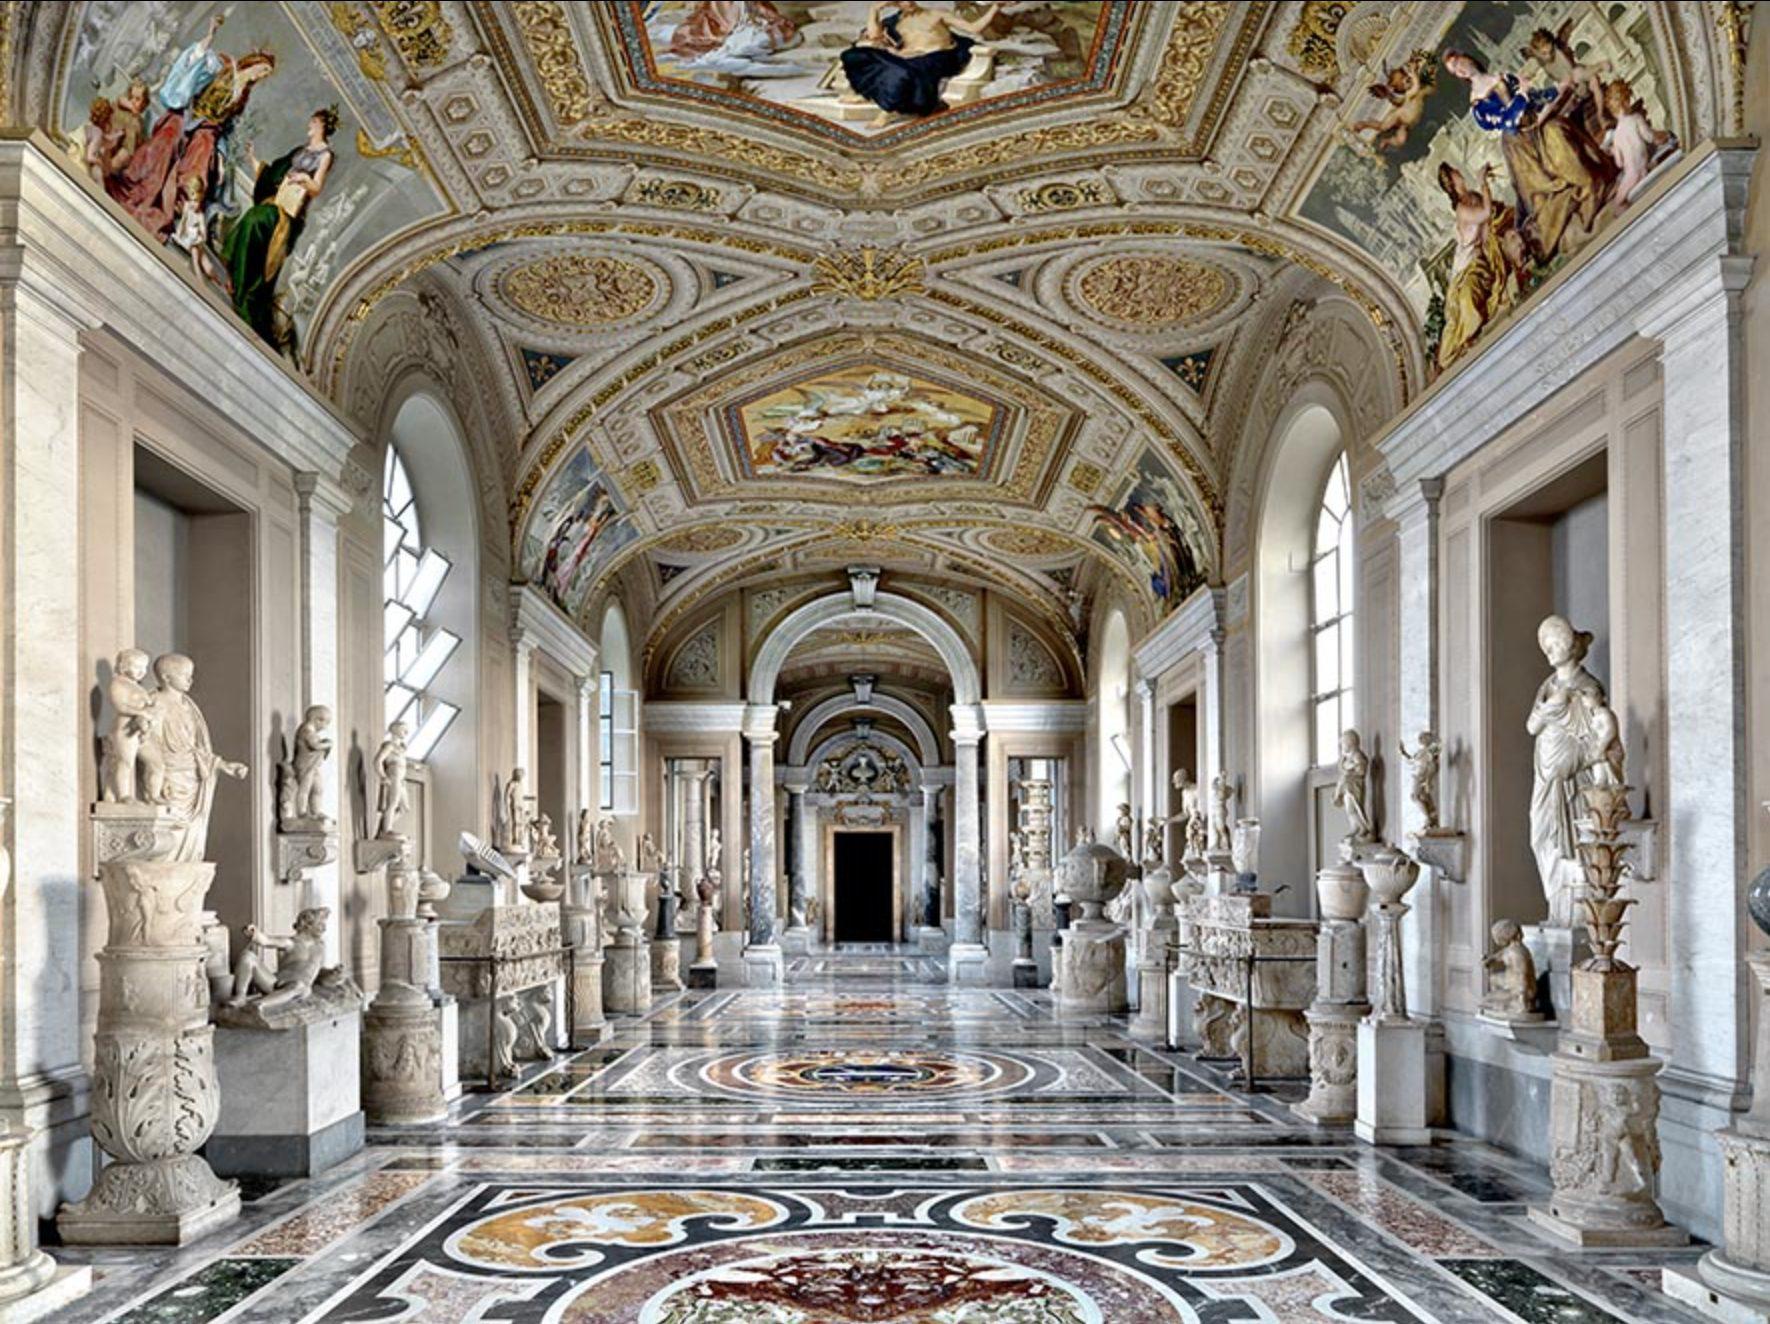 Musei Vaticani XIX, Galleria dei Candelabri